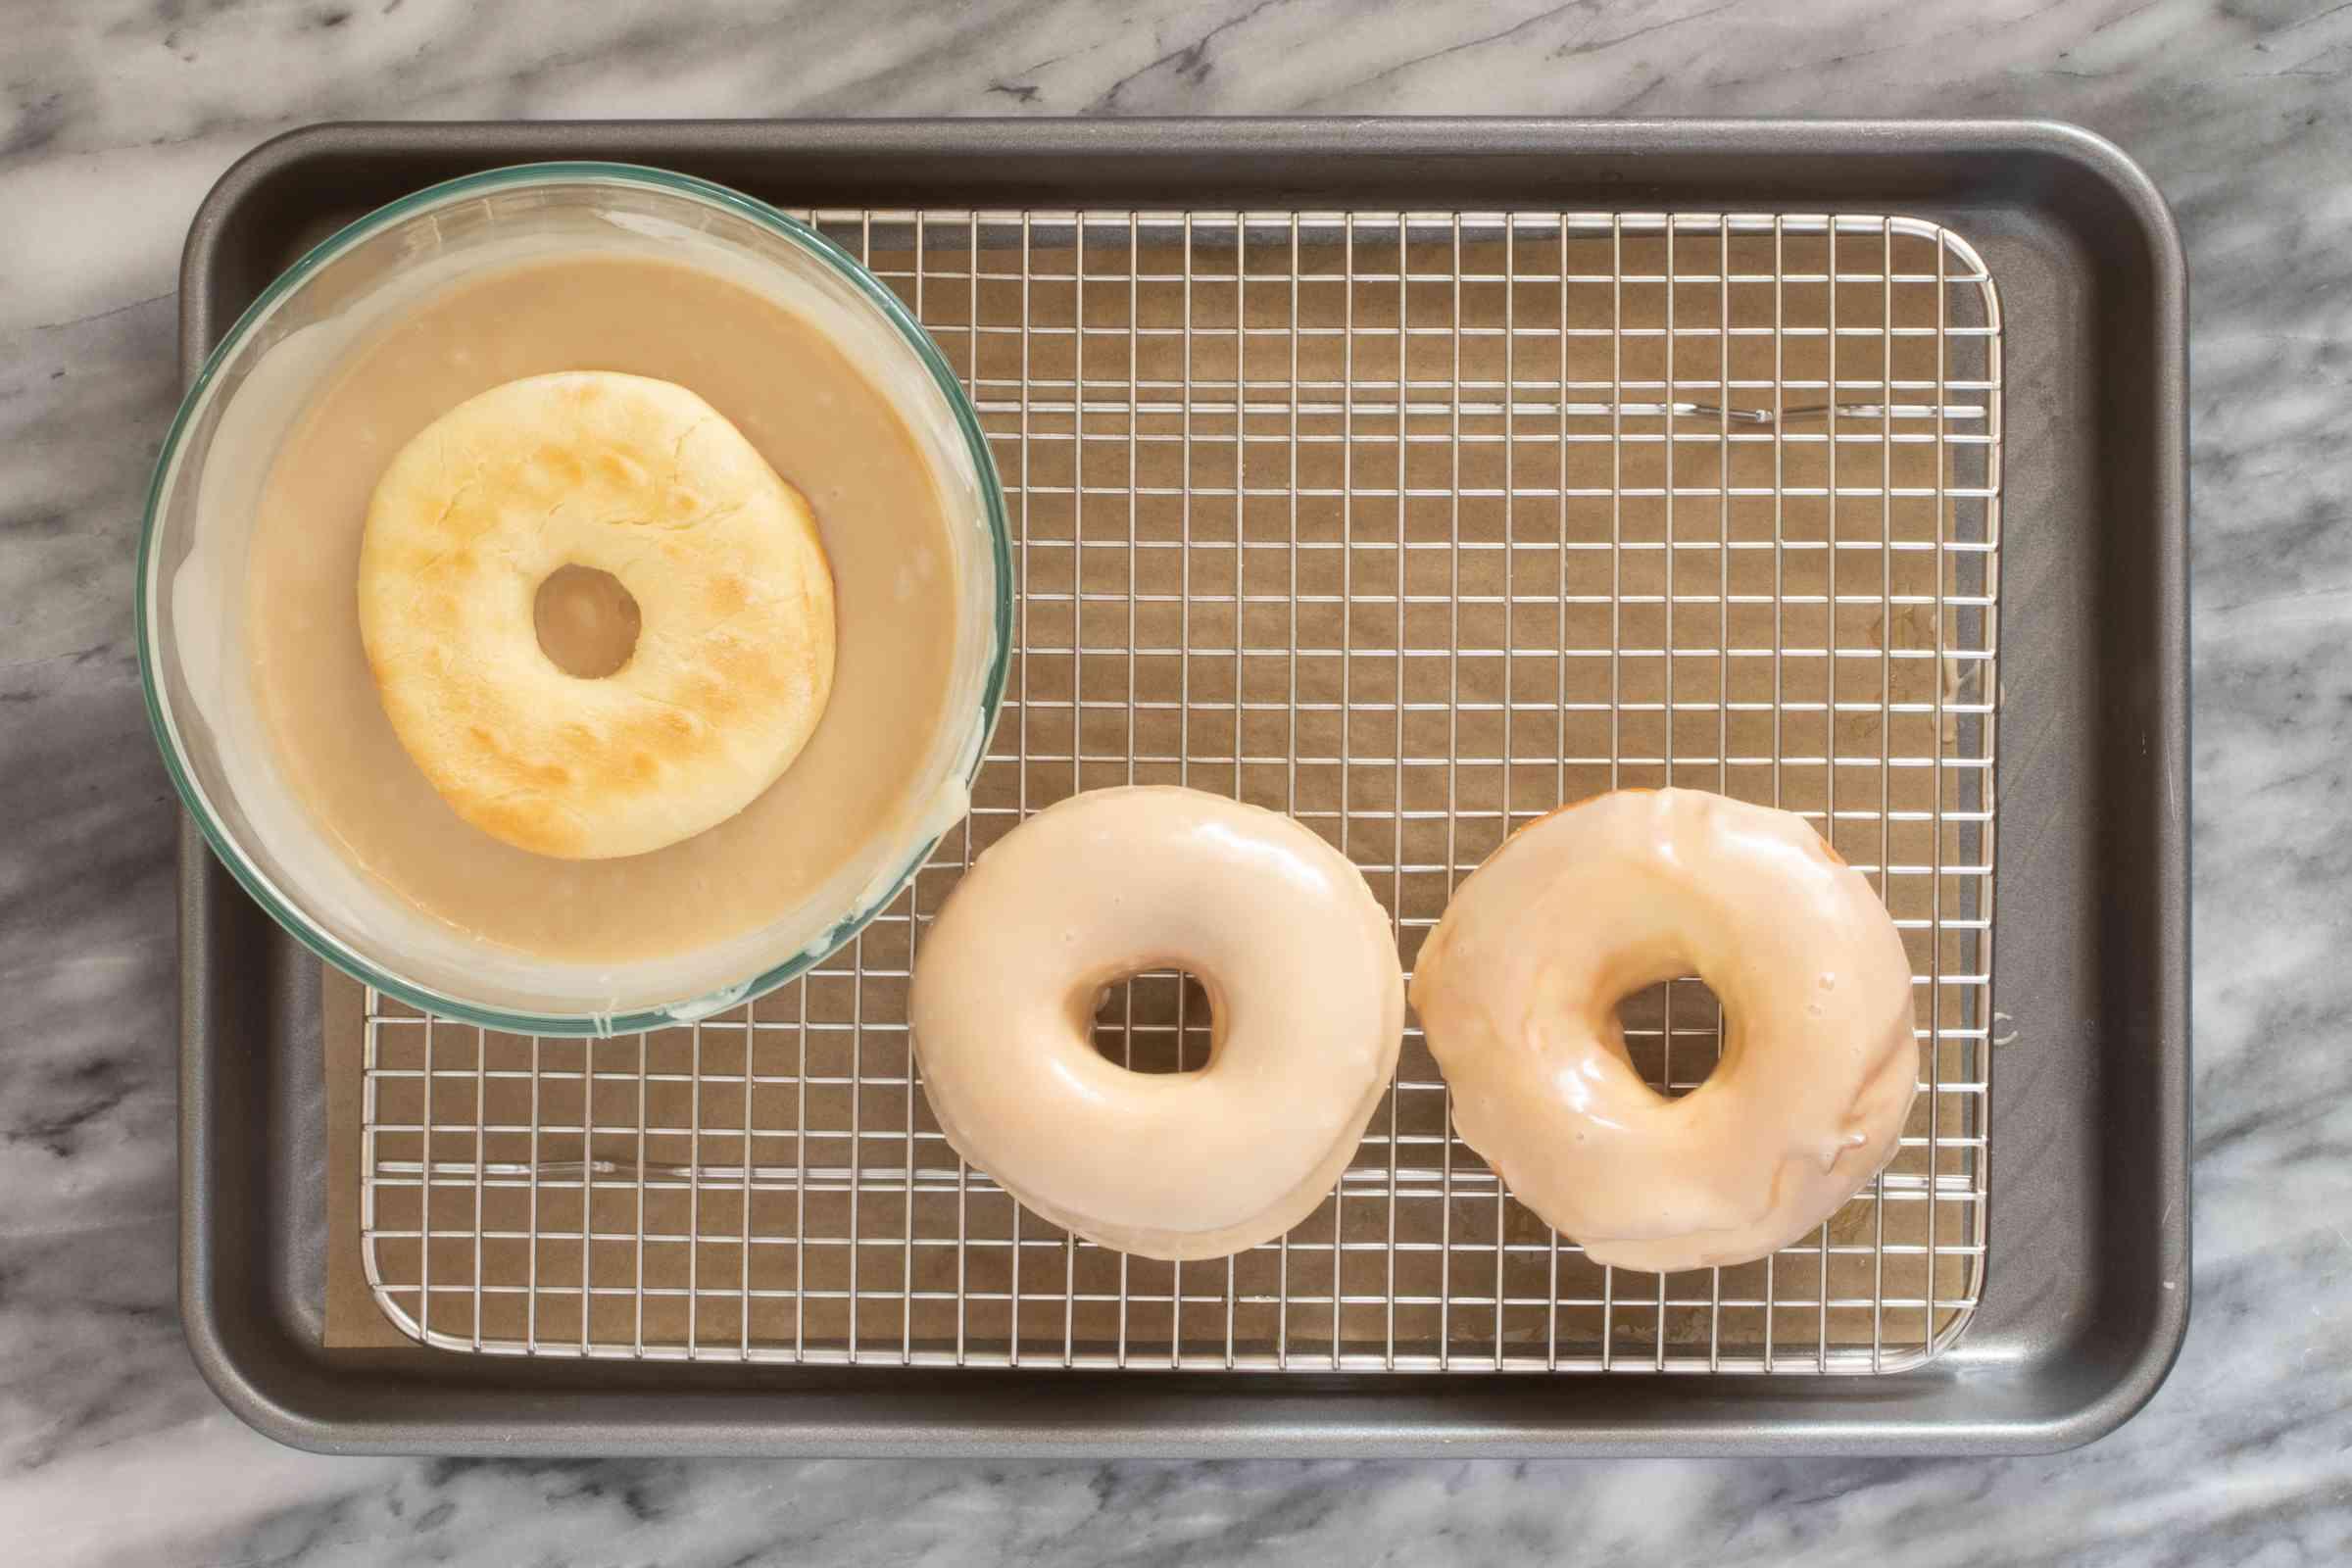 Glazing warm doughnuts